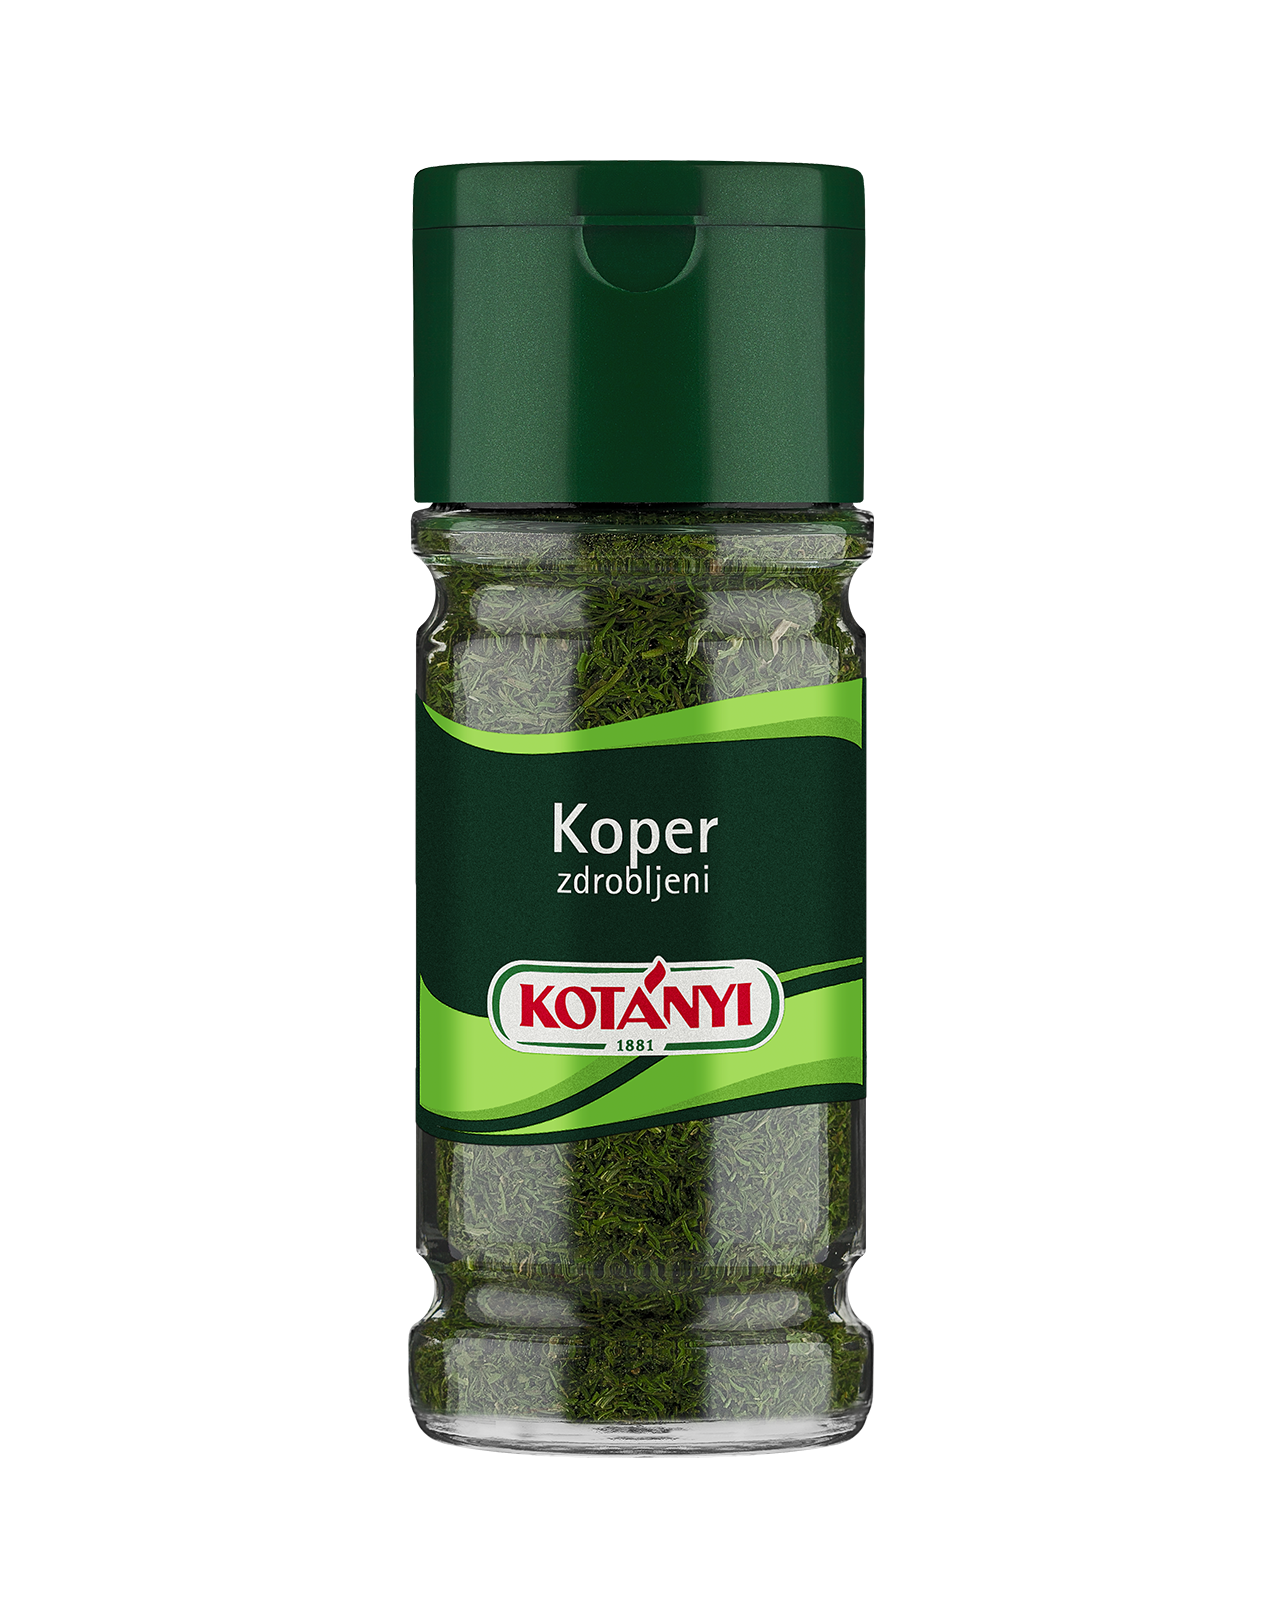 401206 Kotanyi Koper Zdrobljen B2c Glass M